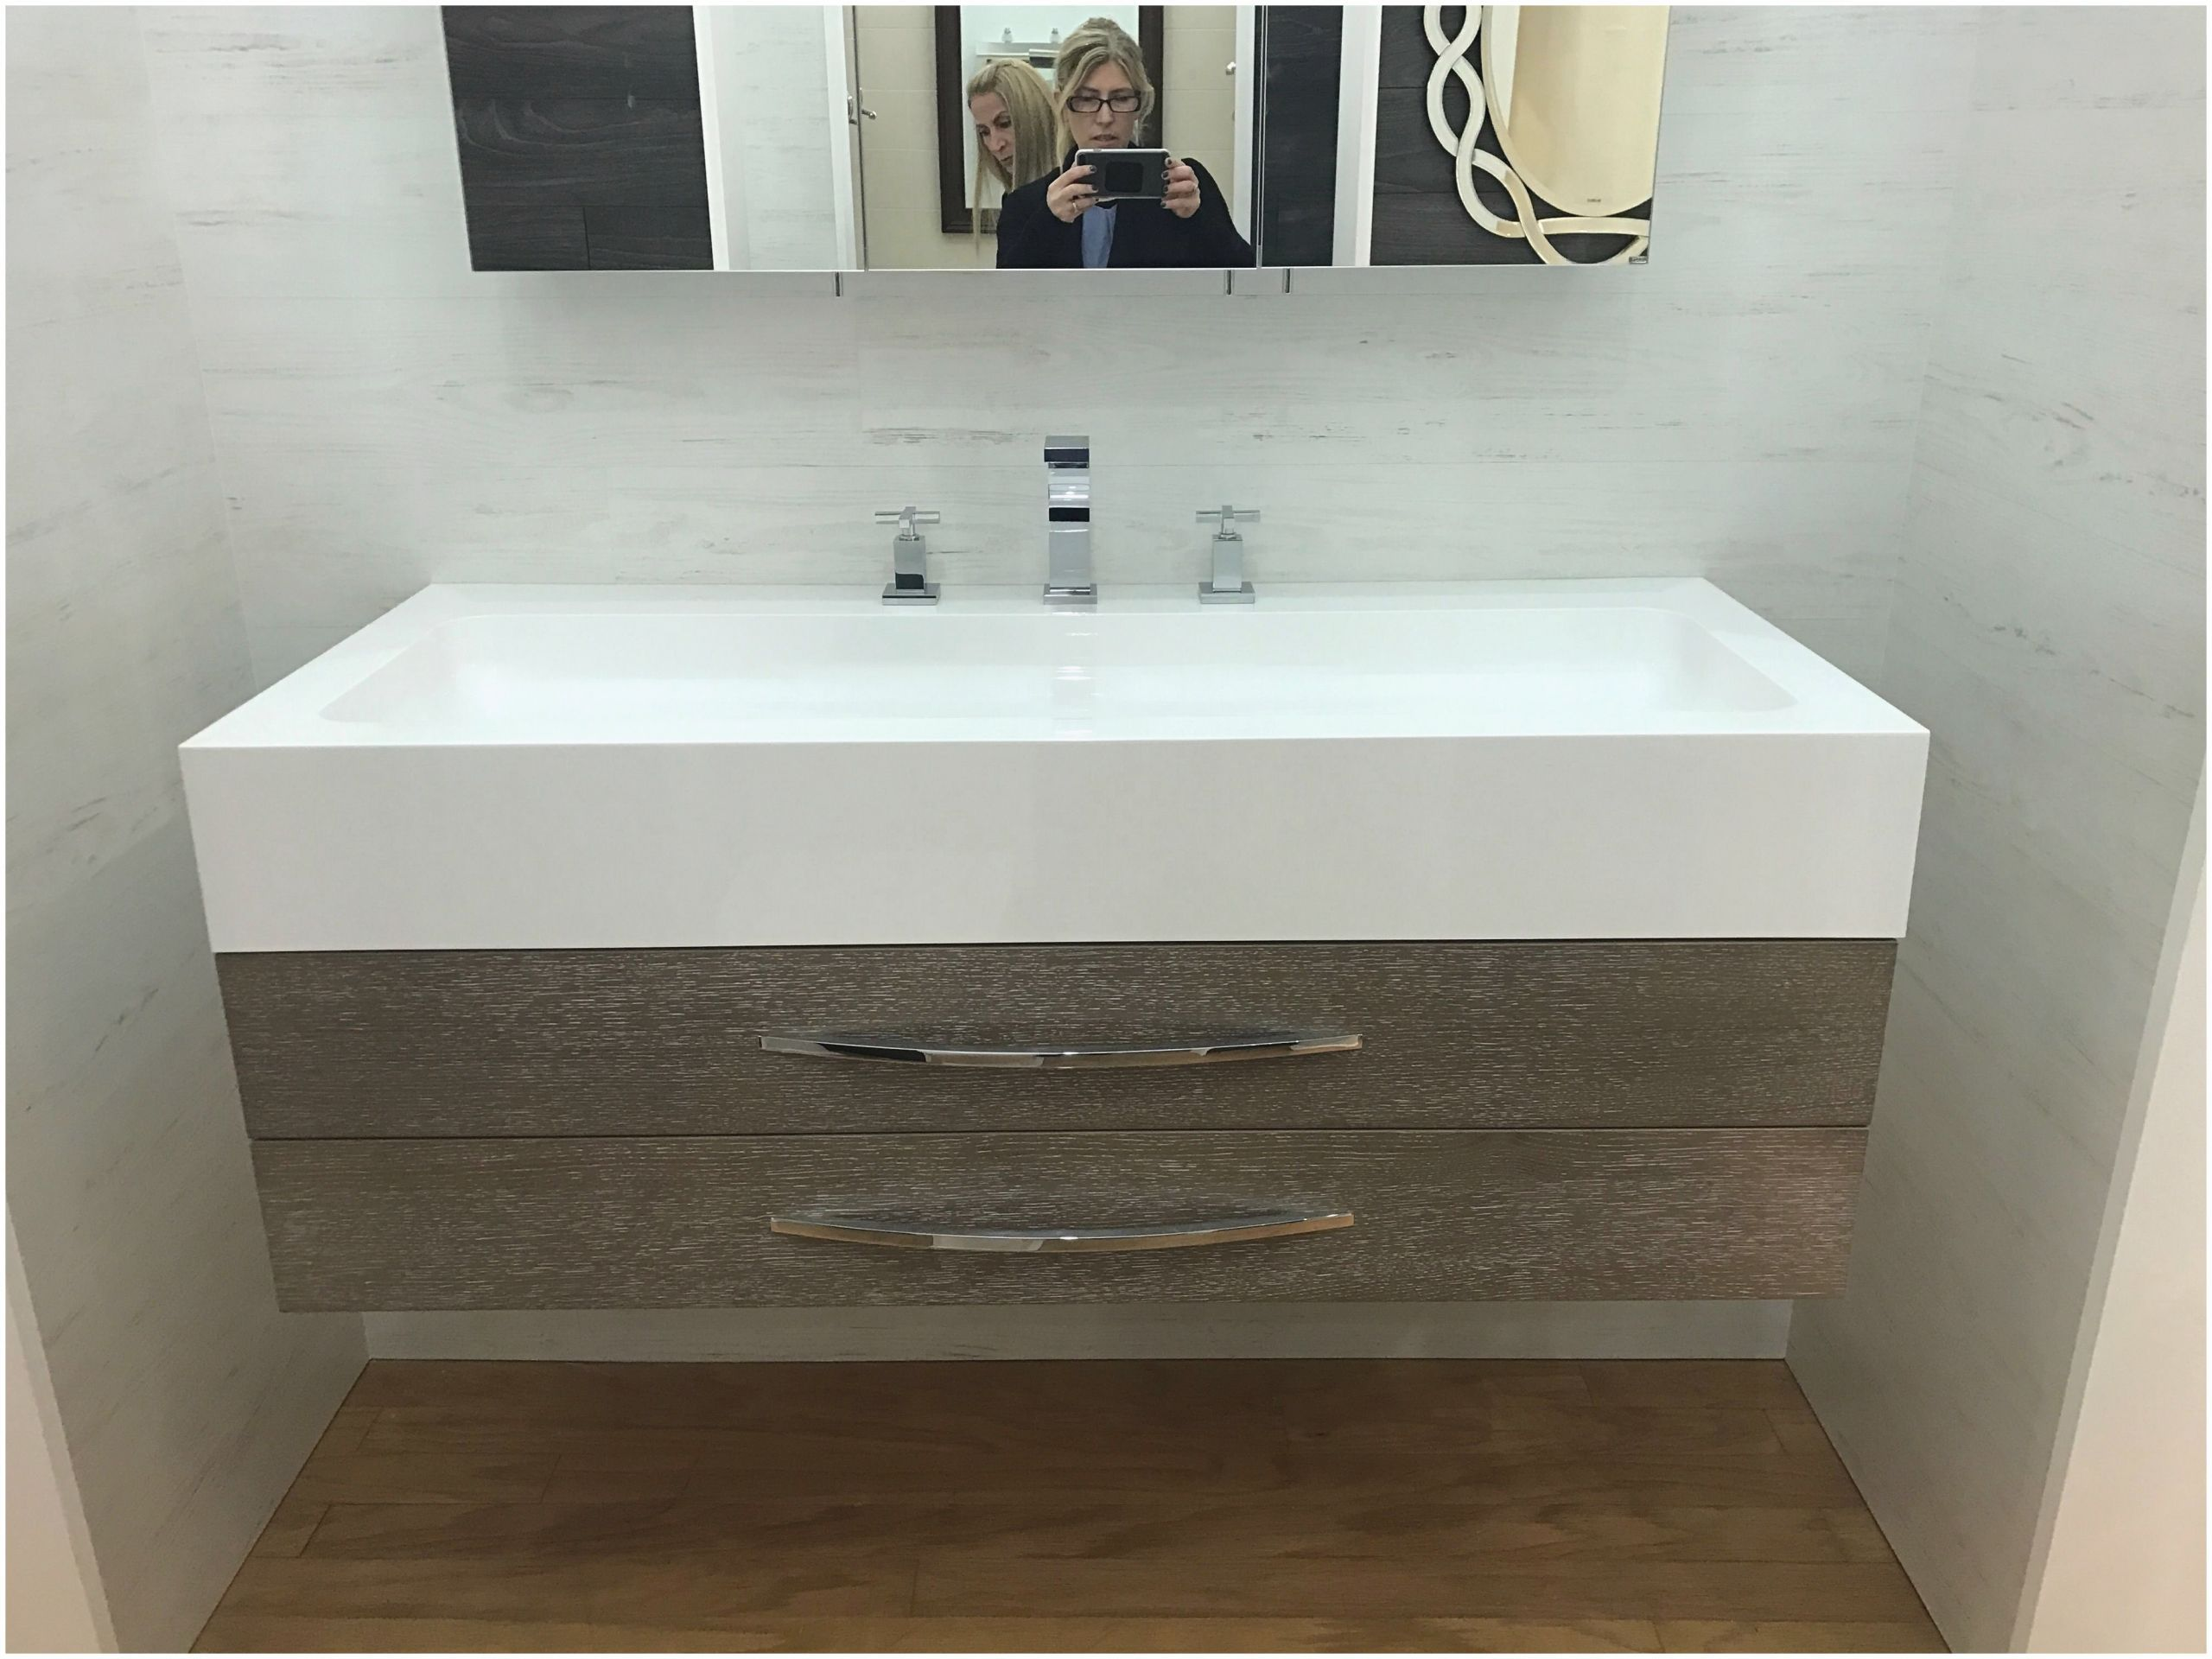 Clearance Bathroom Vanities With Tops In 2020 Small Bathroom